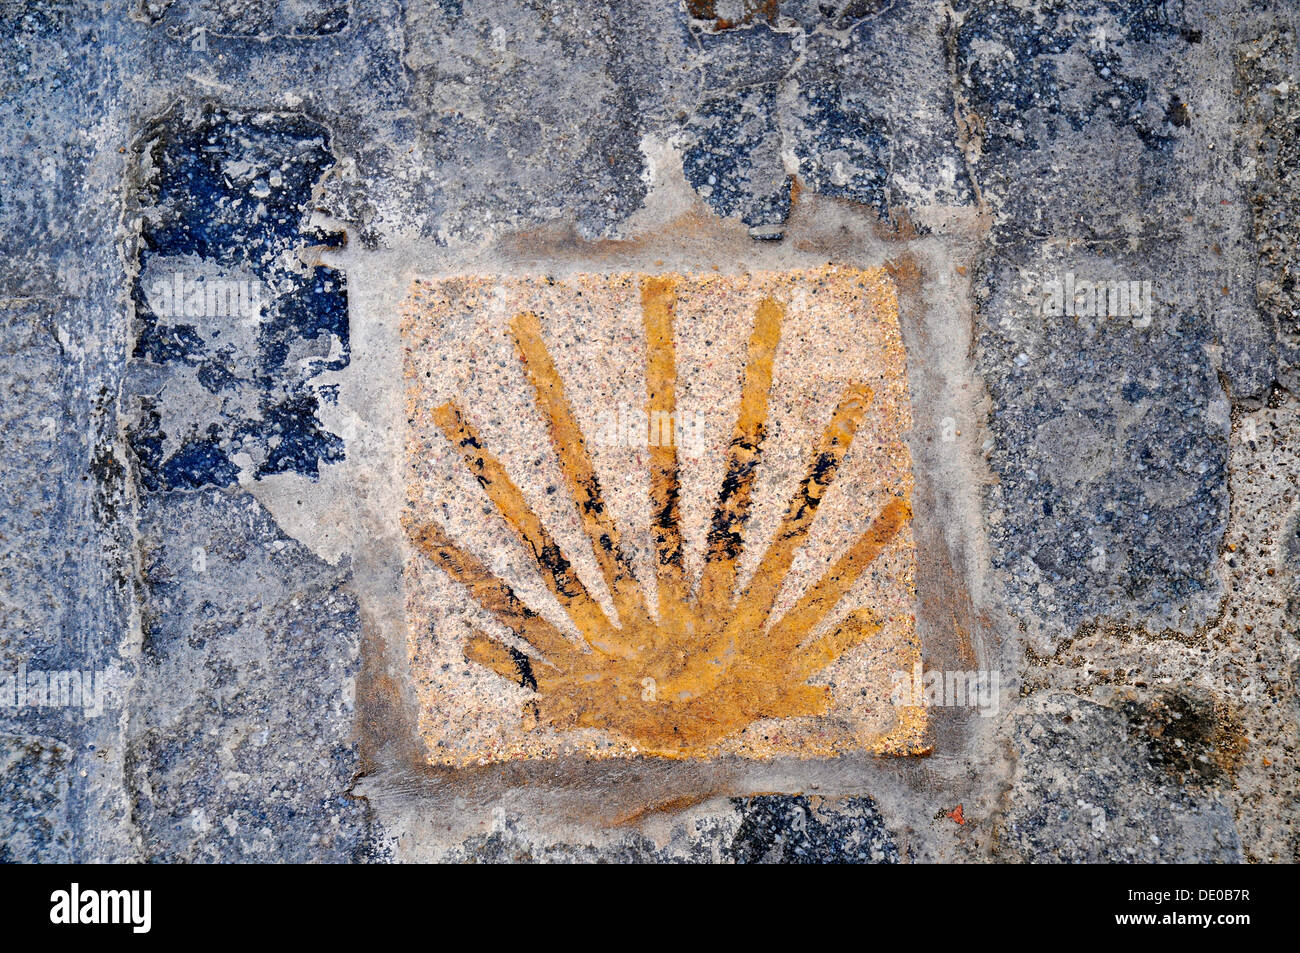 Scallop, Camino de Santiago, Way of St. James, pilgrimage route, marking, pavement, Montblanc, Tarragona province, Catalonia - Stock Image